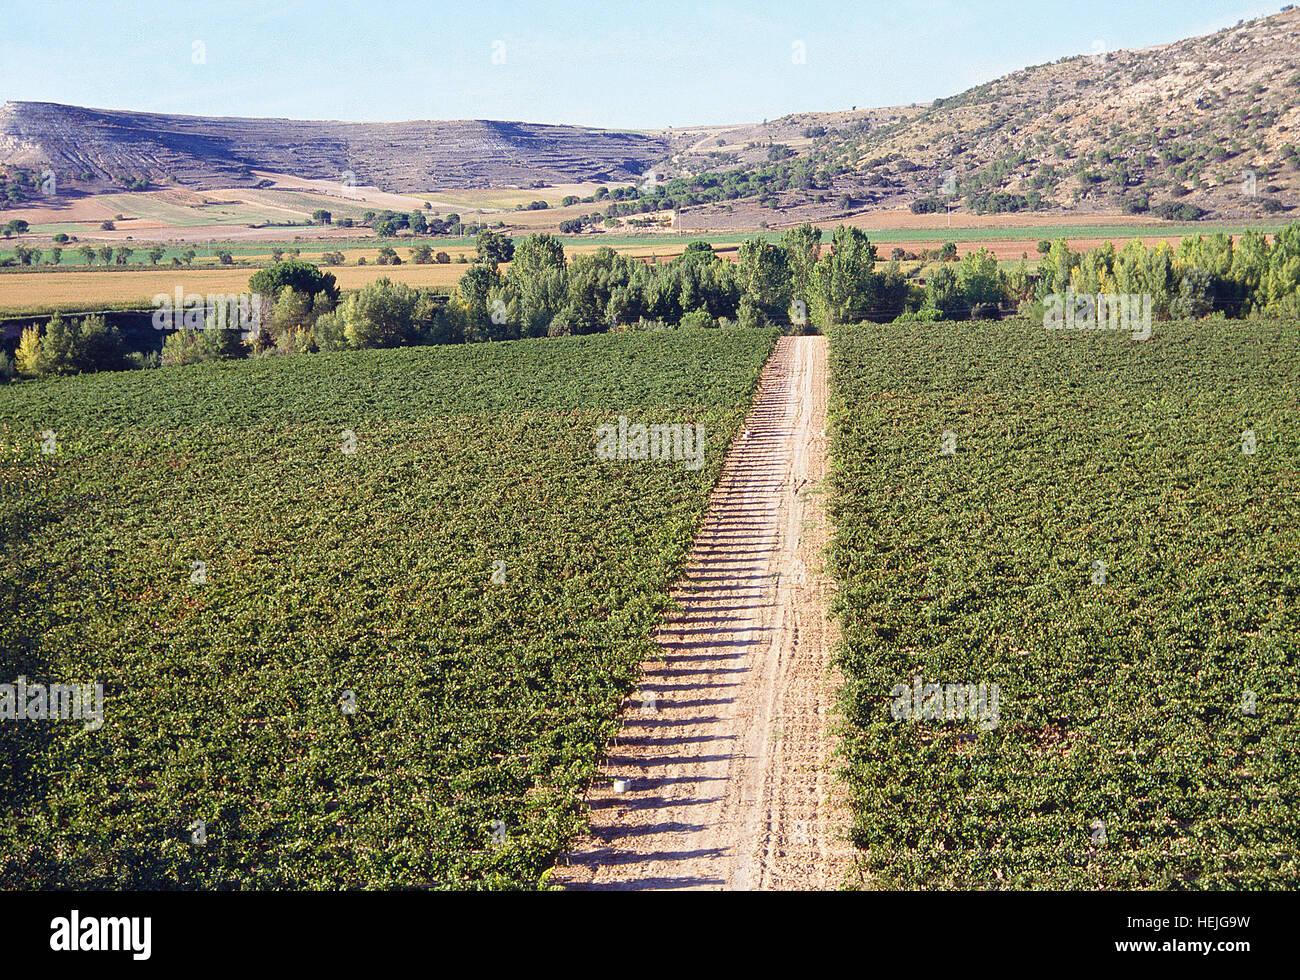 Vineyards. Ribera del Duero, Valladolid province, Castilla Leon, Spain. - Stock Image